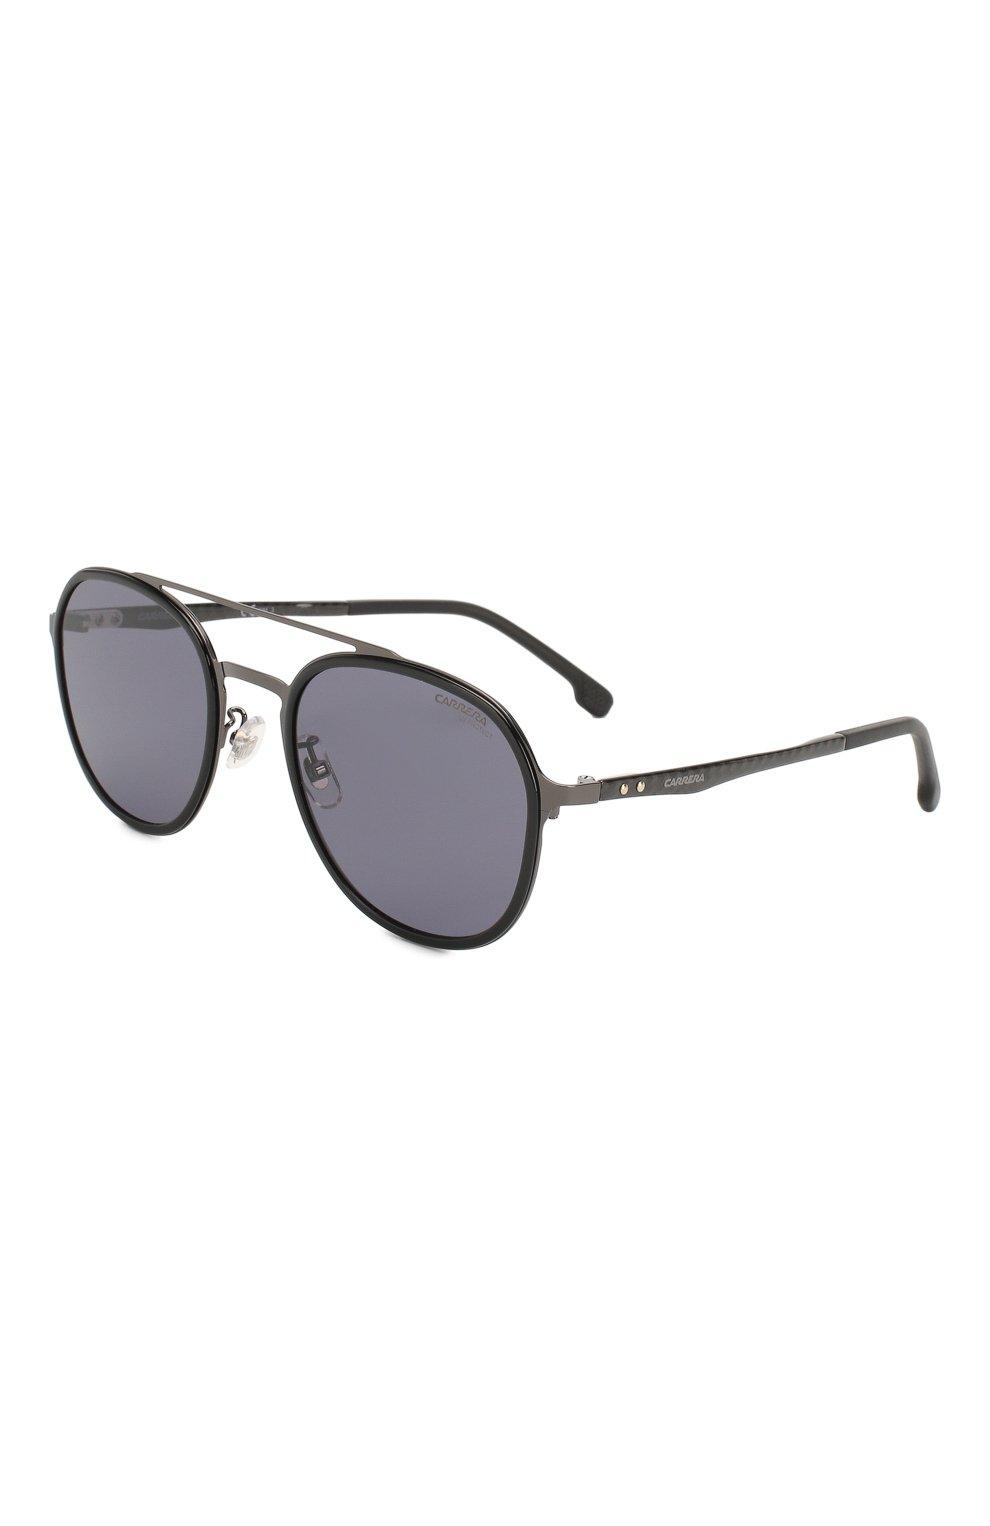 Женские солнцезащитные очки CARRERA темно-серого цвета, арт. CARRERA 8033/G V81 | Фото 1